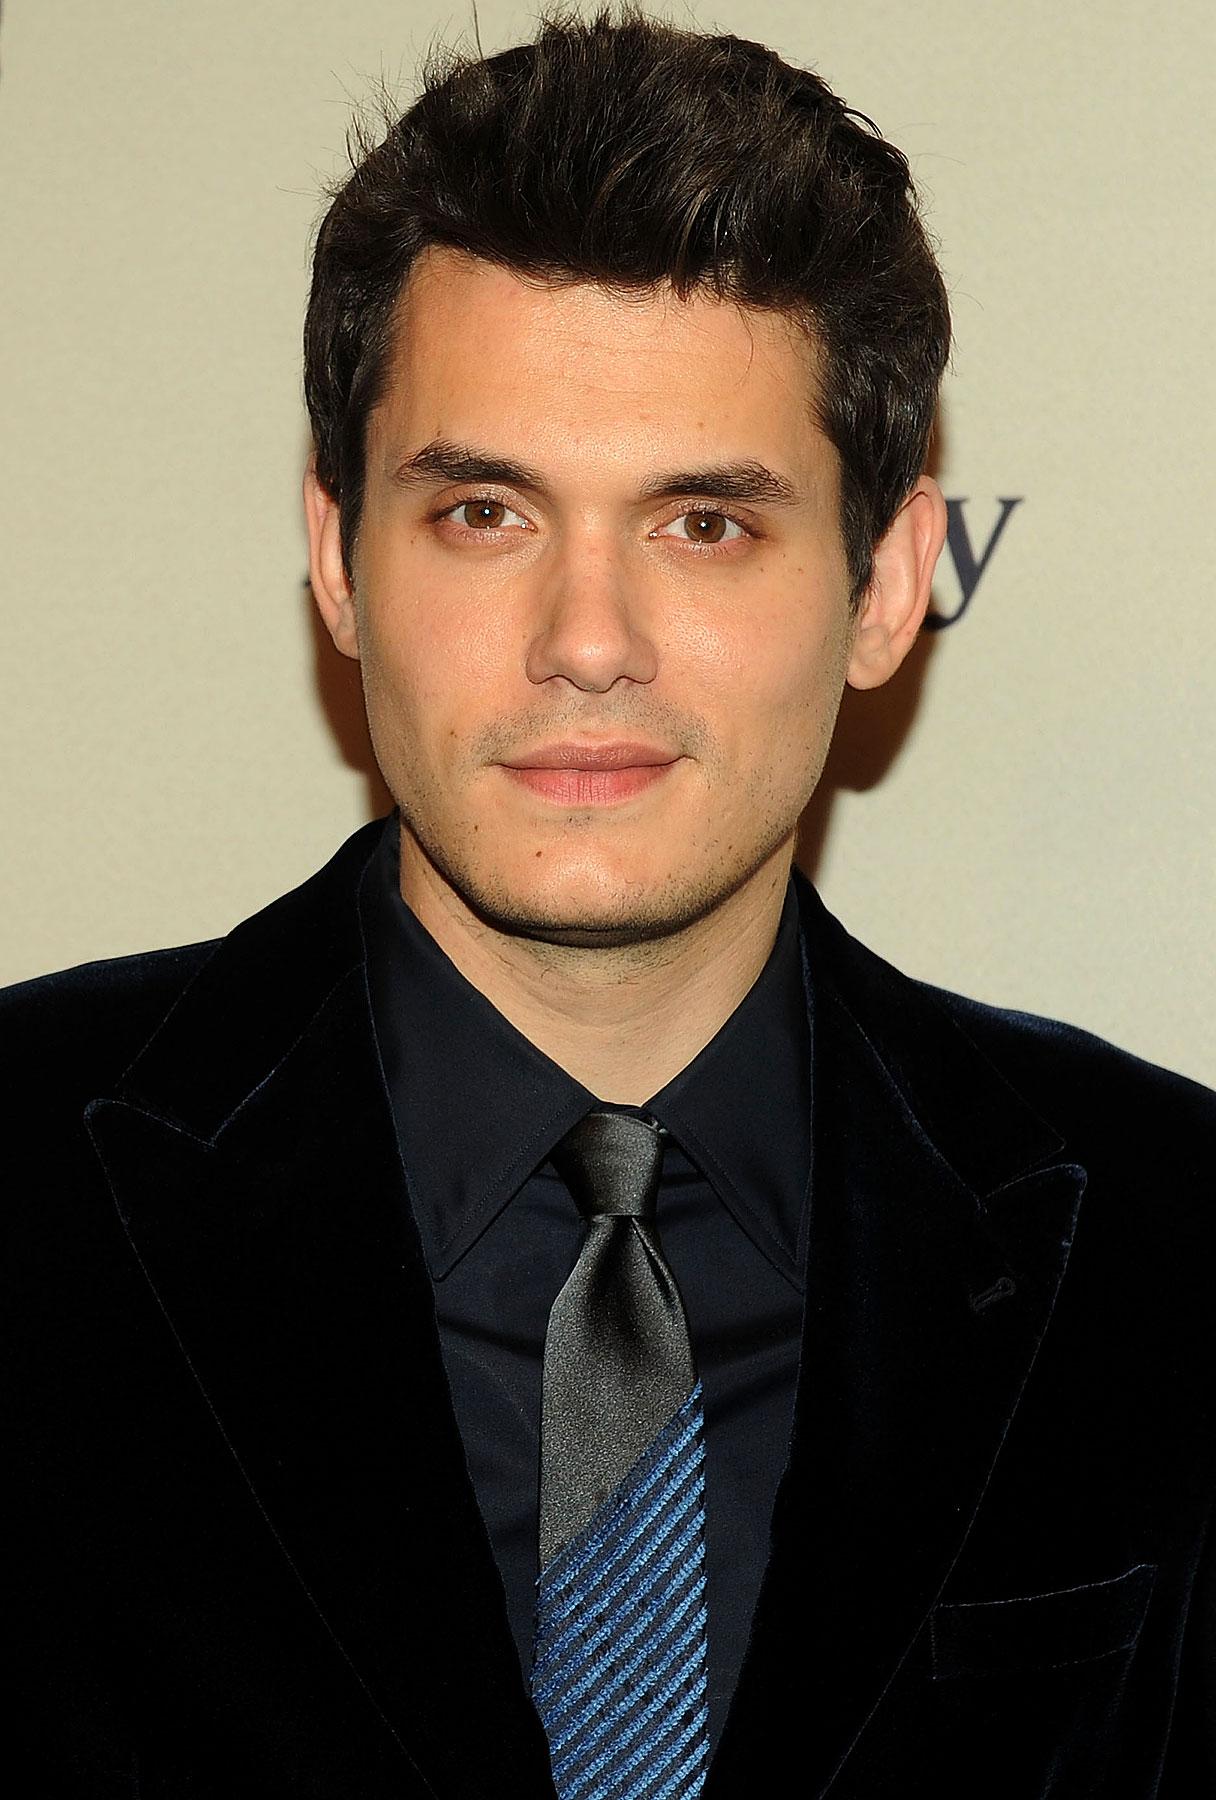 John Mayer Wants More Sex!